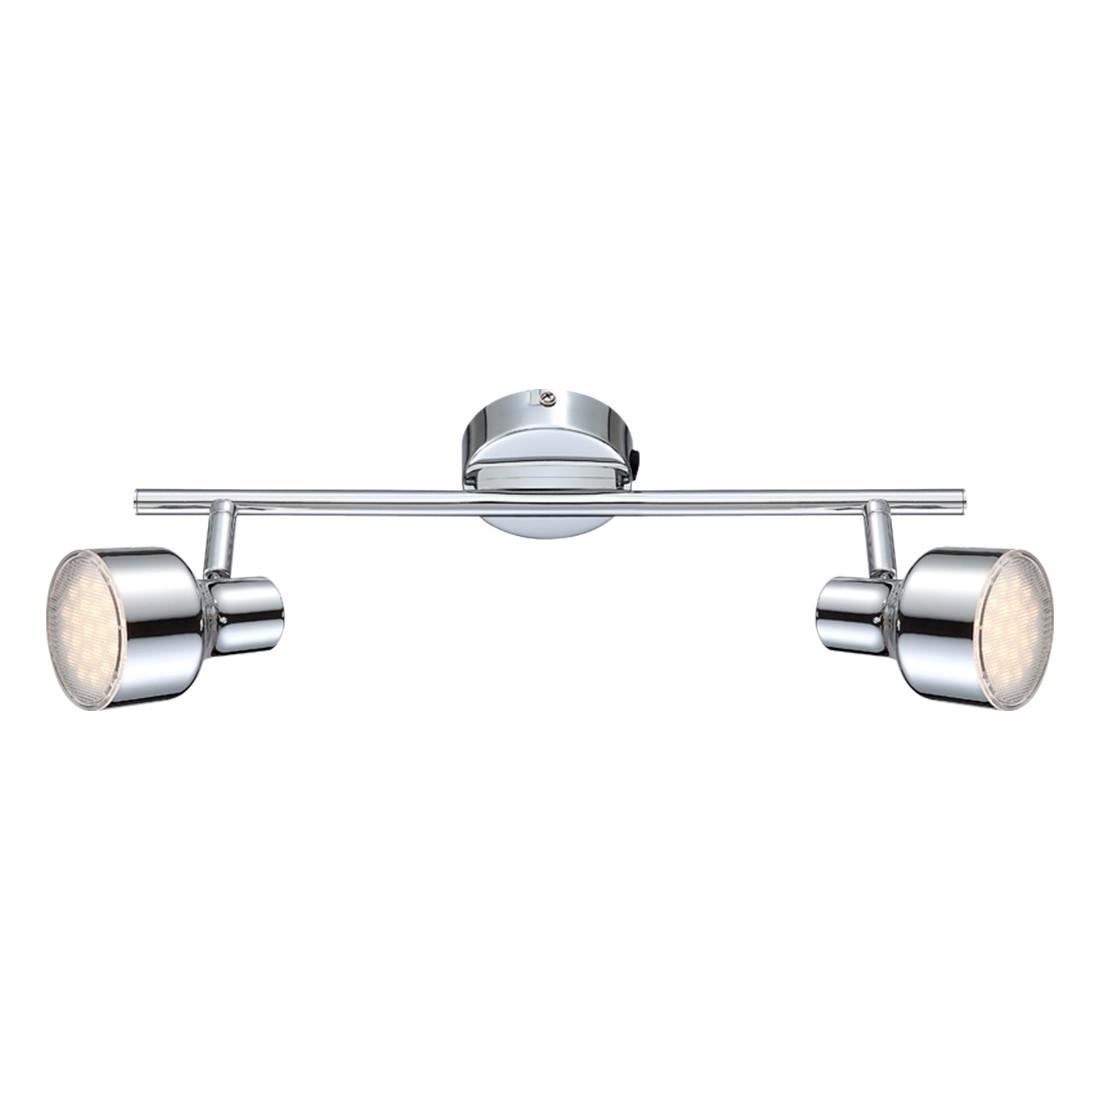 EEK A+, Deckenstrahler ROIS – Metall/Acryl – 2-flammig, Globo Lighting günstig online kaufen